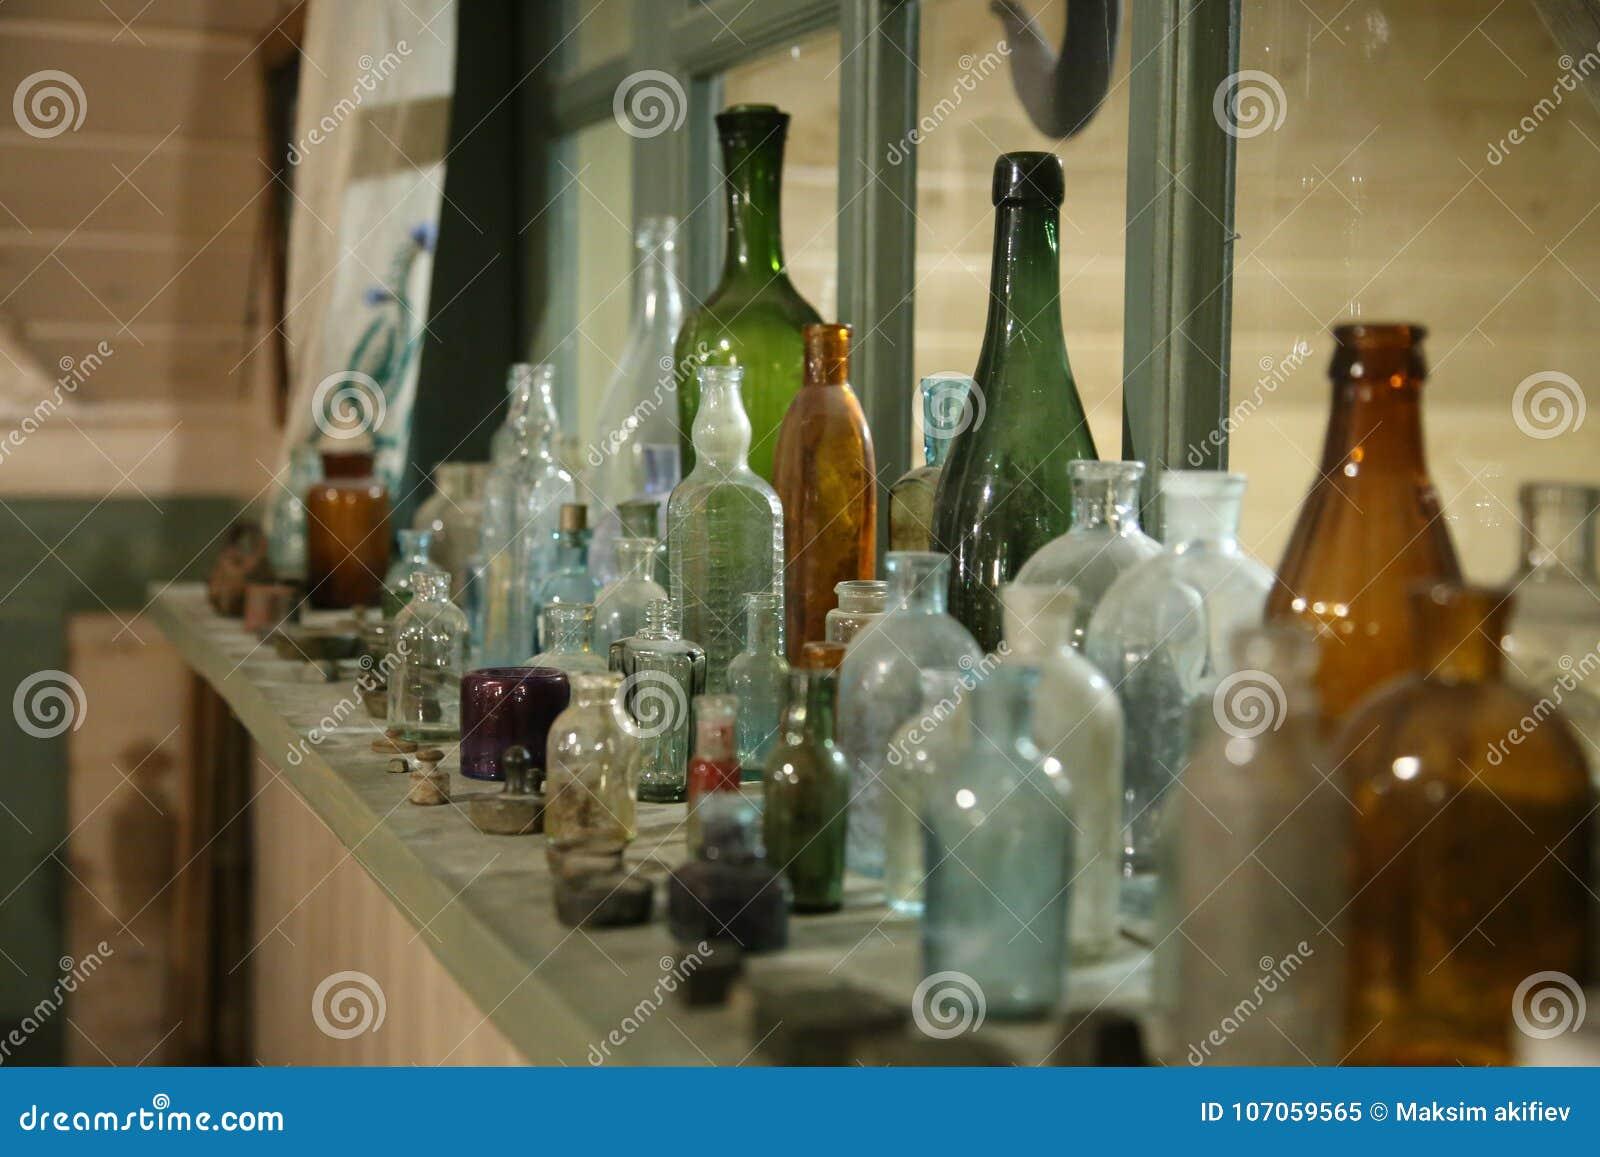 Gamla glasflaskor och flaskor